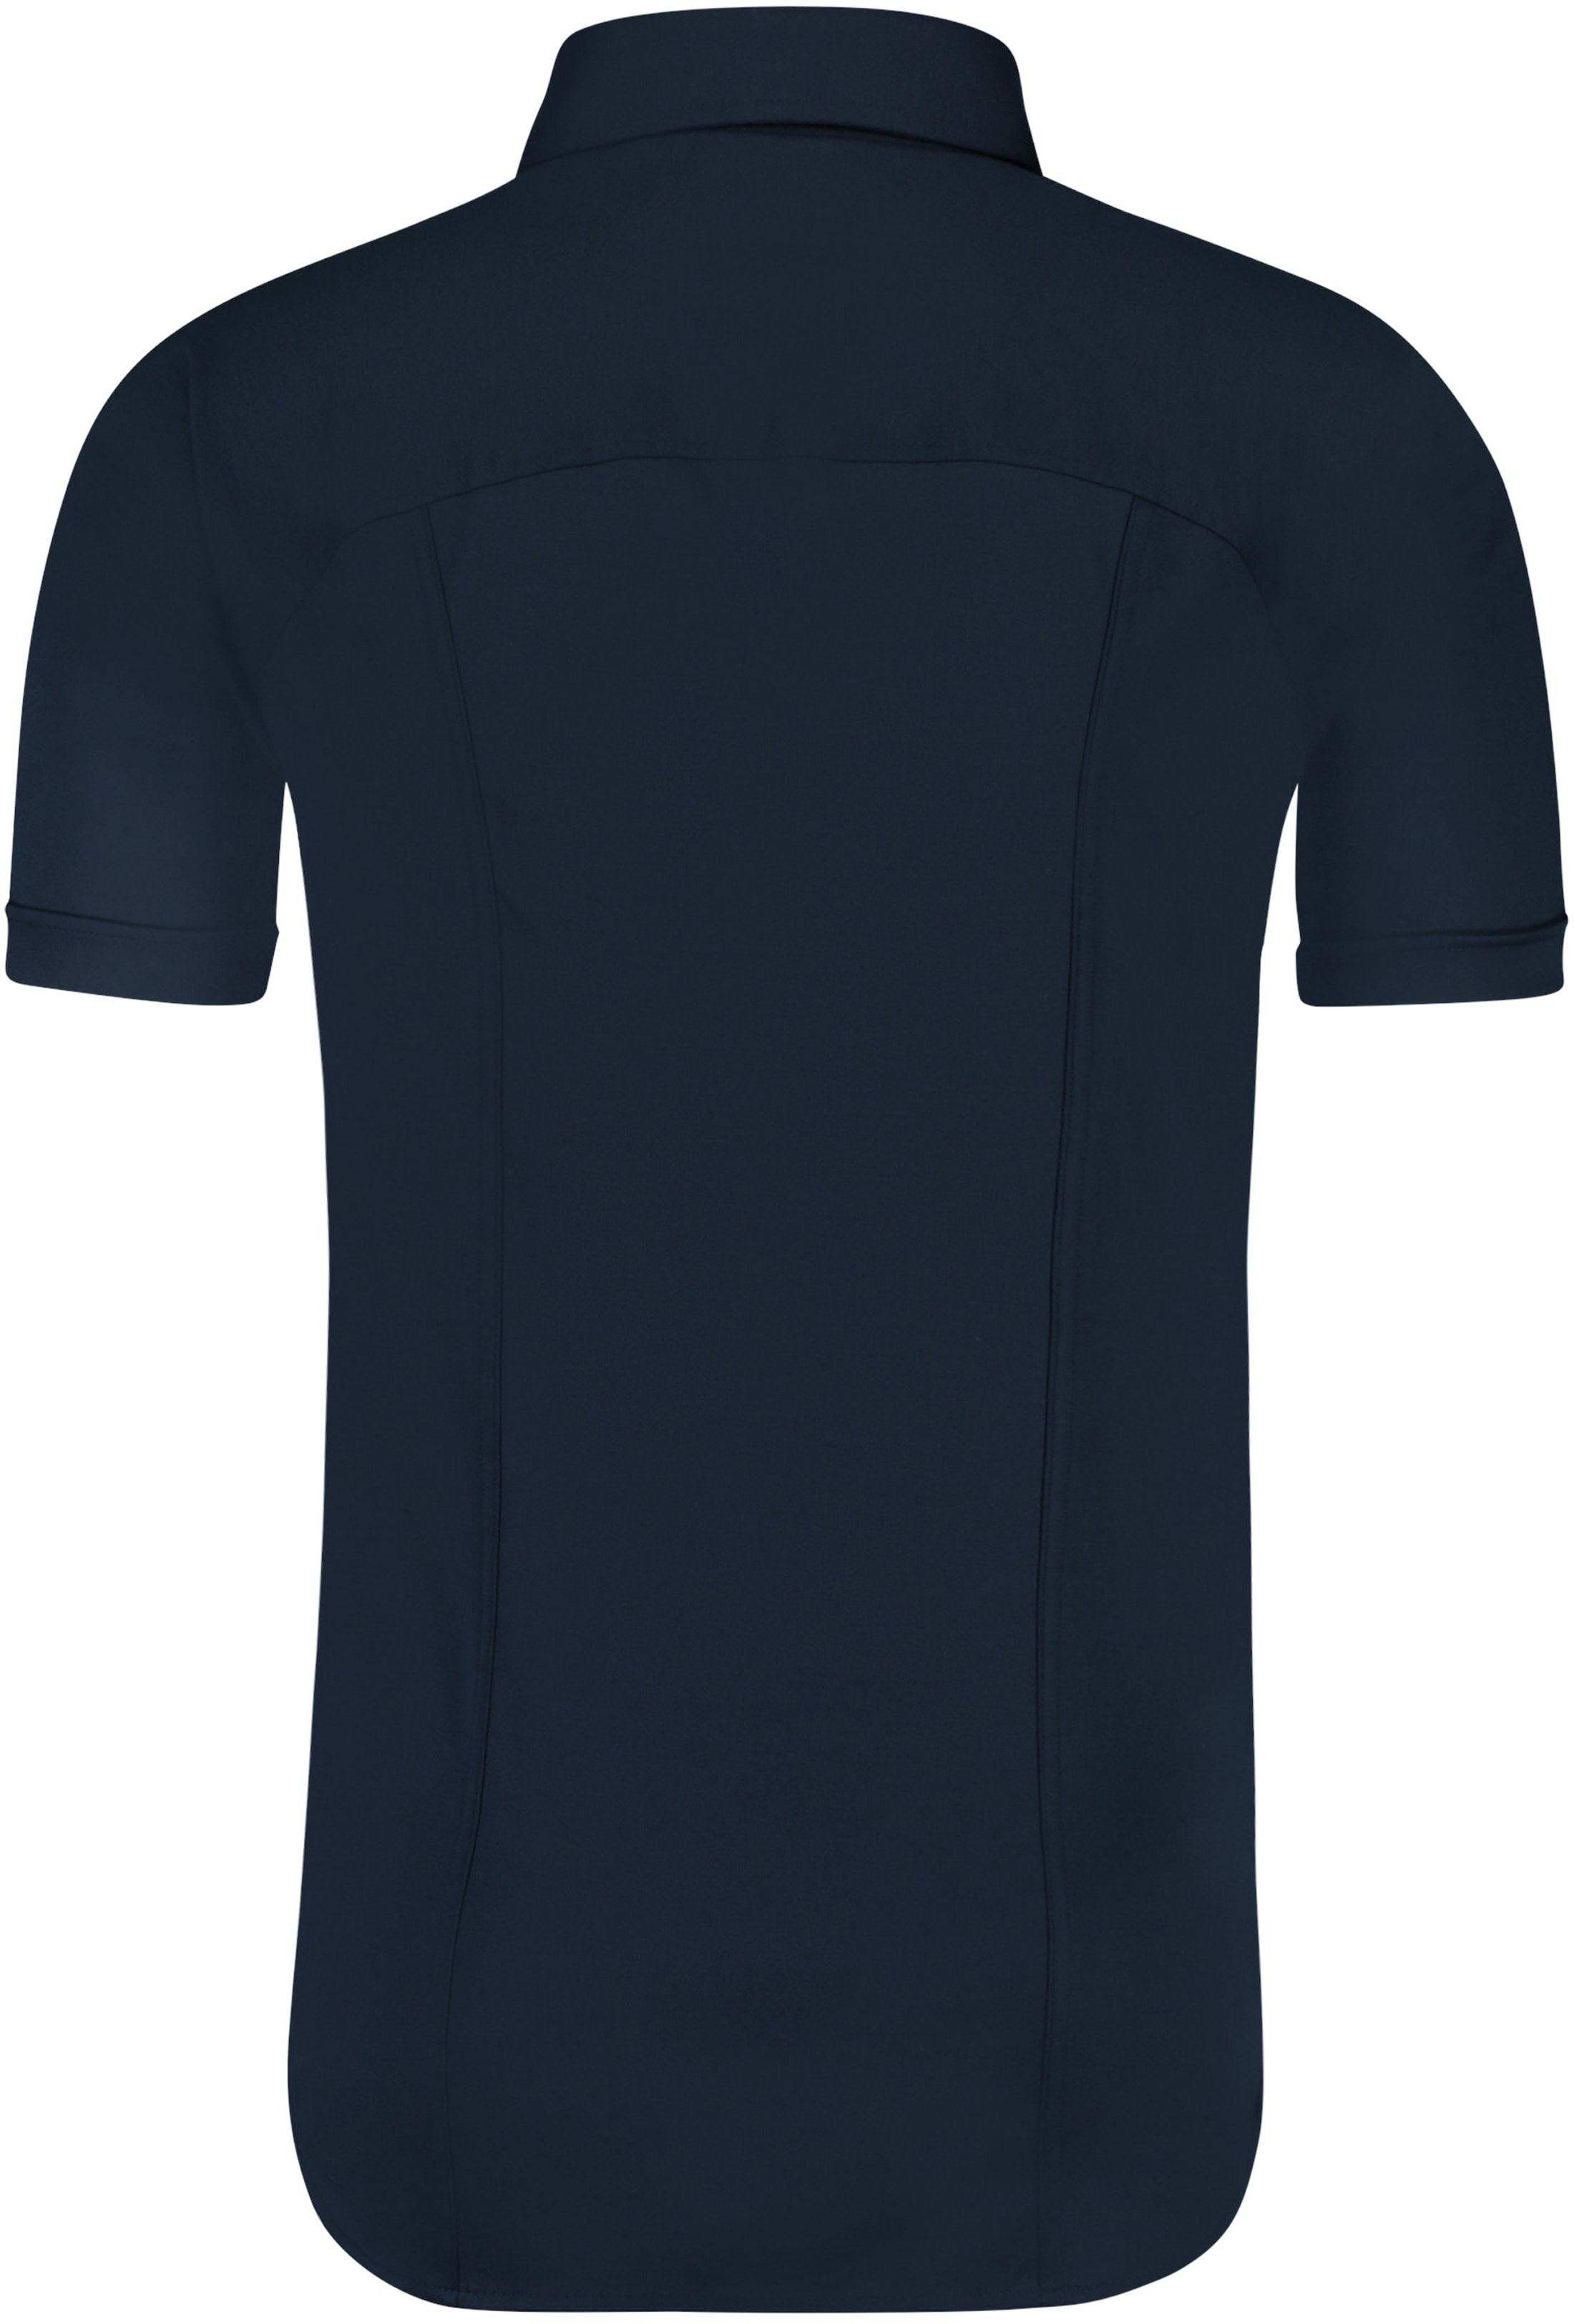 Desoto Shirt Short Sleeve Navy 057